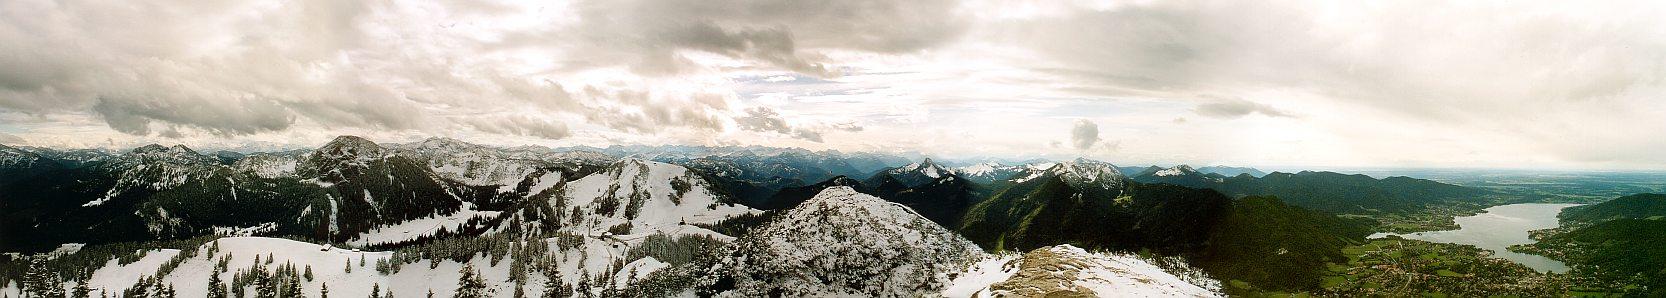 Bergpanorama vom Wallberg/Tegernsee